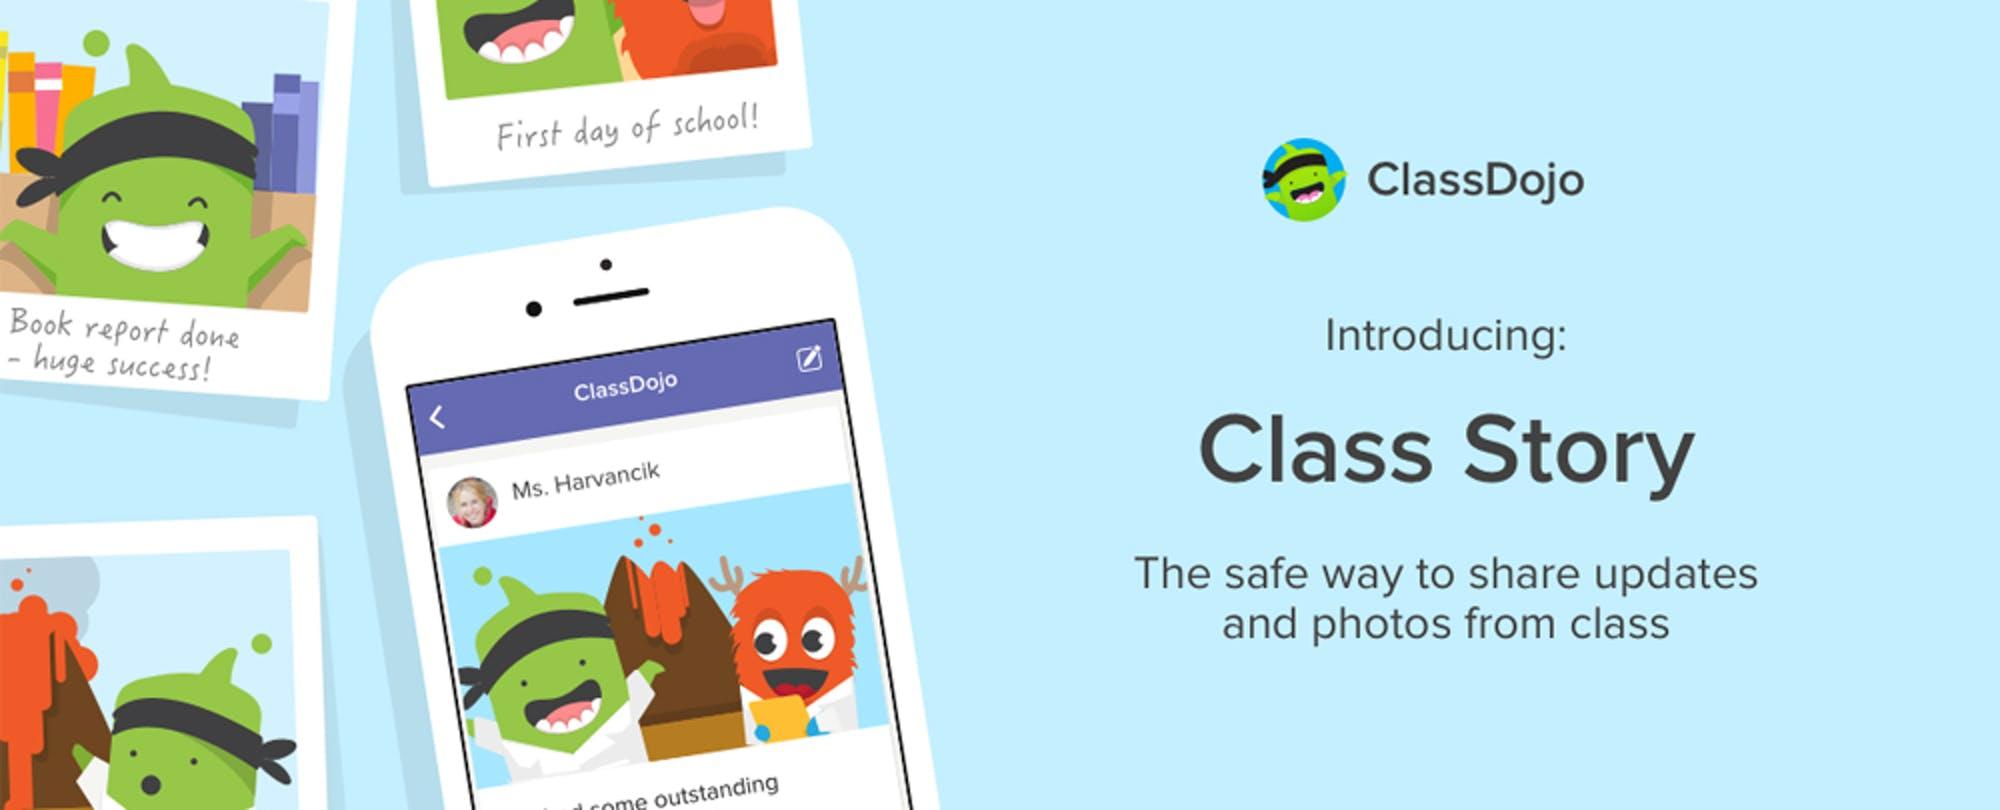 ClassDojo's Summer Updates Include 'Instagram for the Classroom'